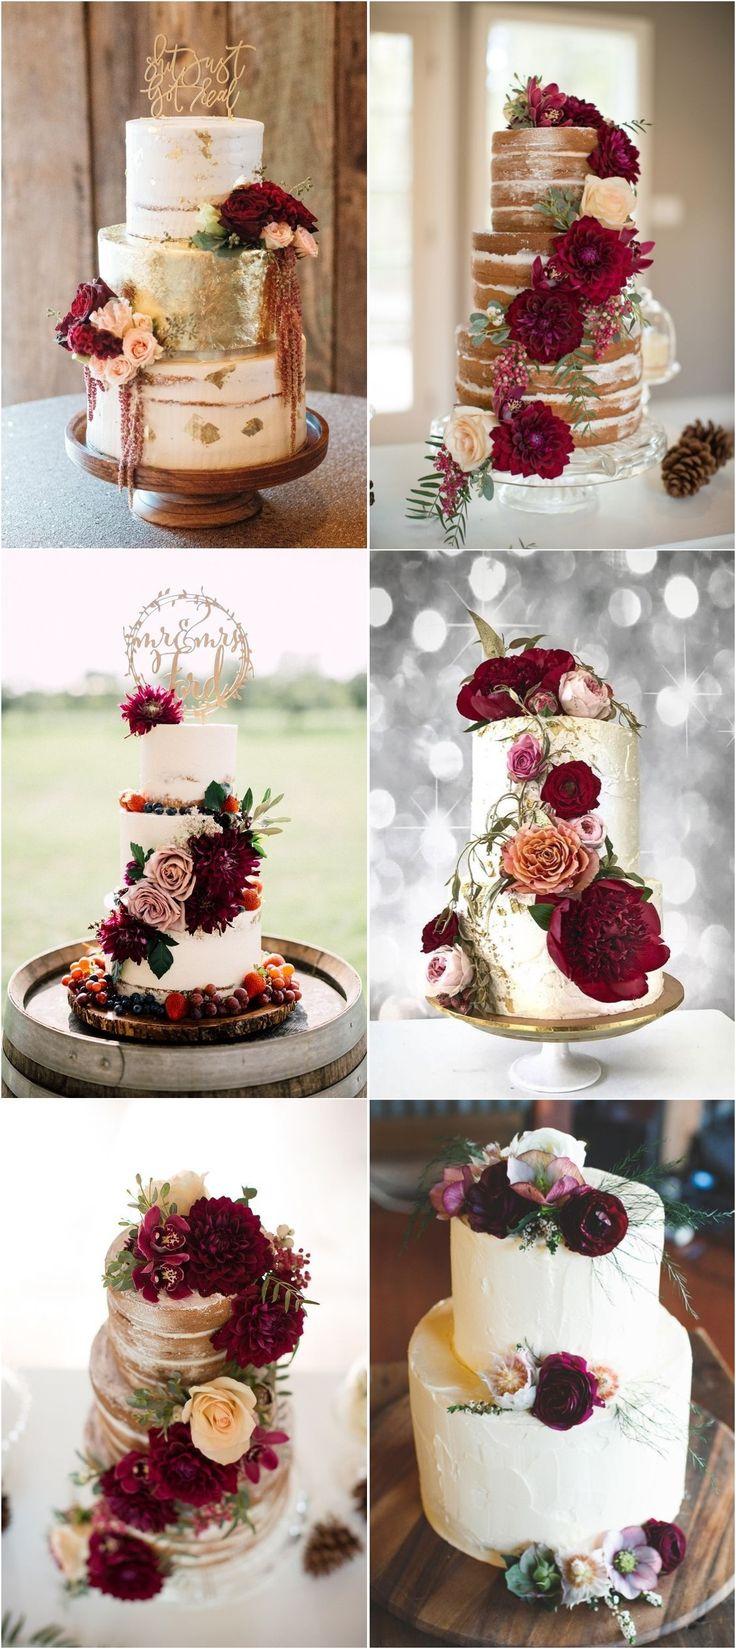 Burgunder Hochzeitstorte Idee #weddingcakes #red #wedding #weddingideas #fallweddin …   – Sweet